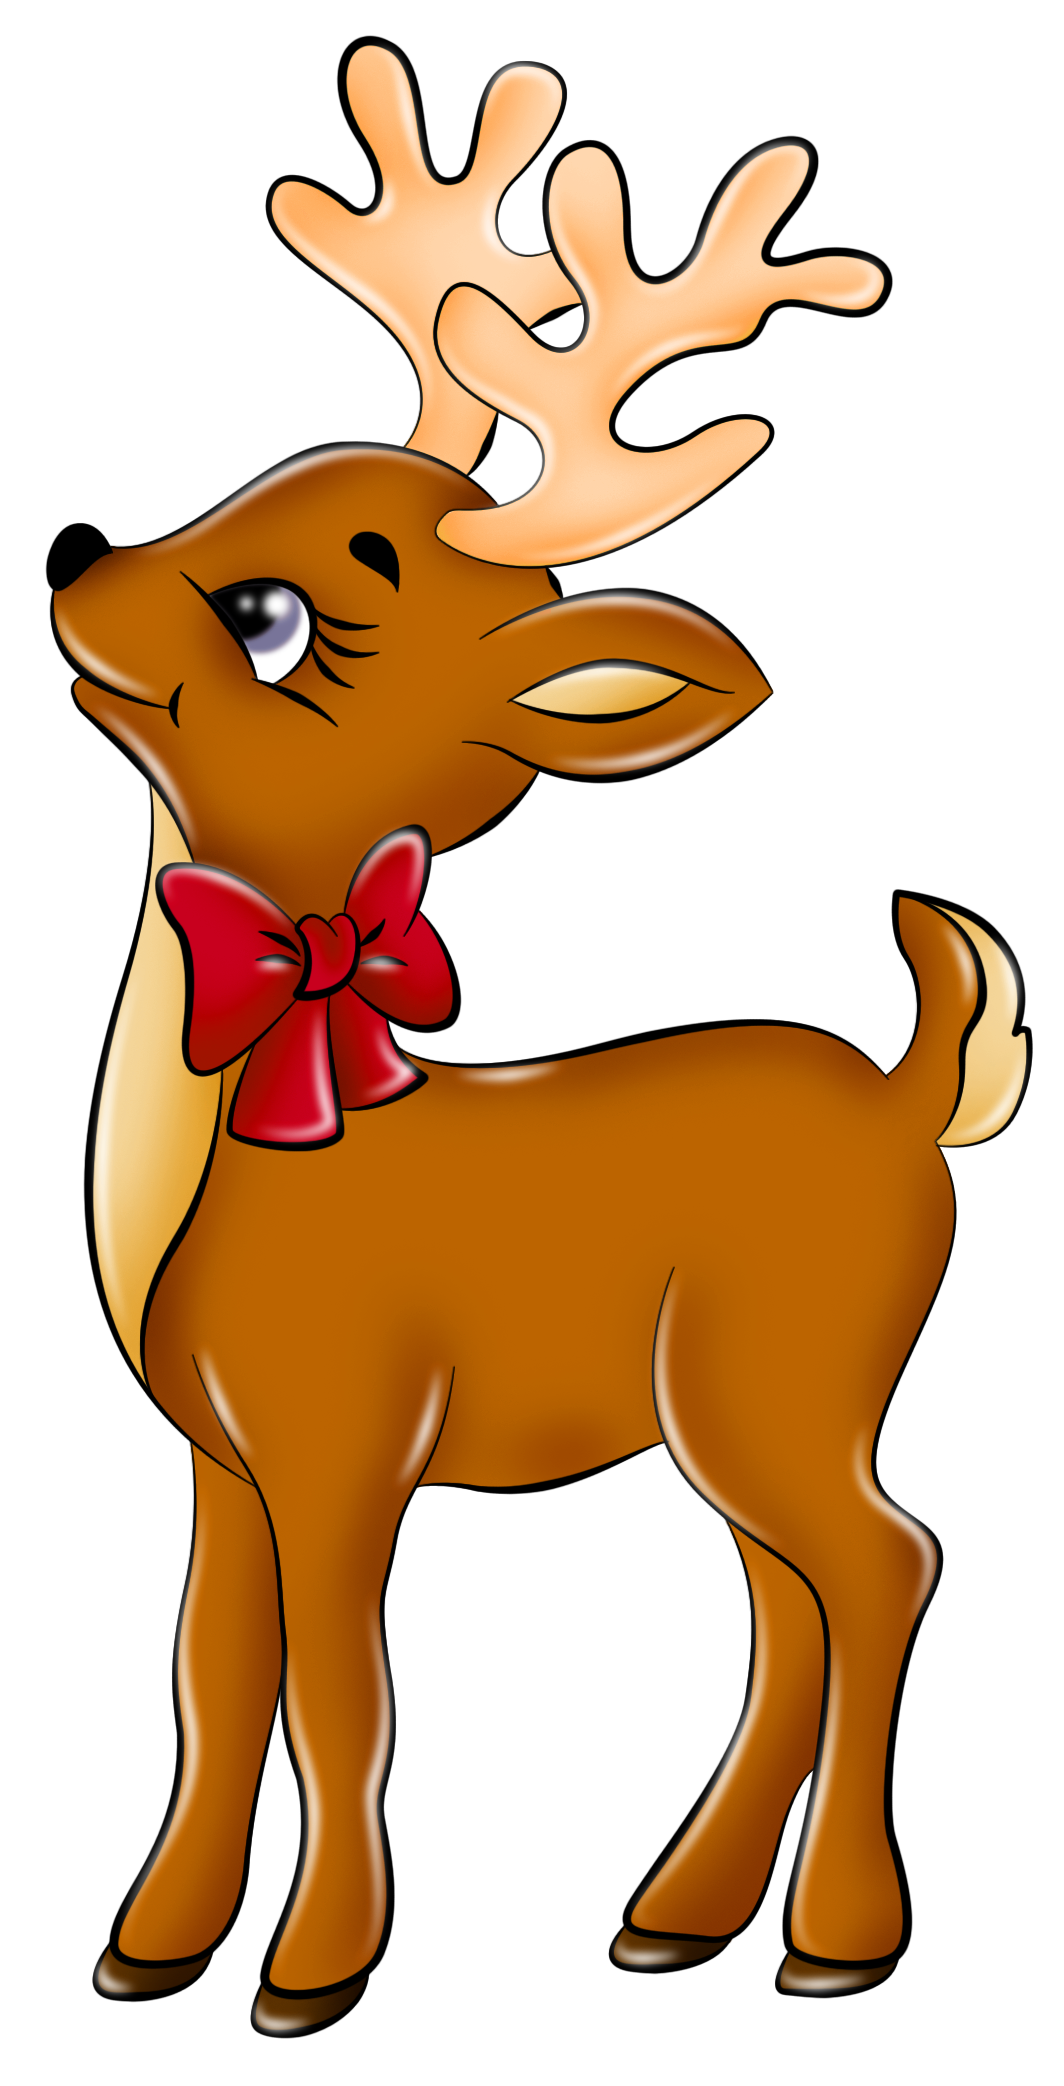 1064x2086 Reindeer Clipart Free Download Clip Art